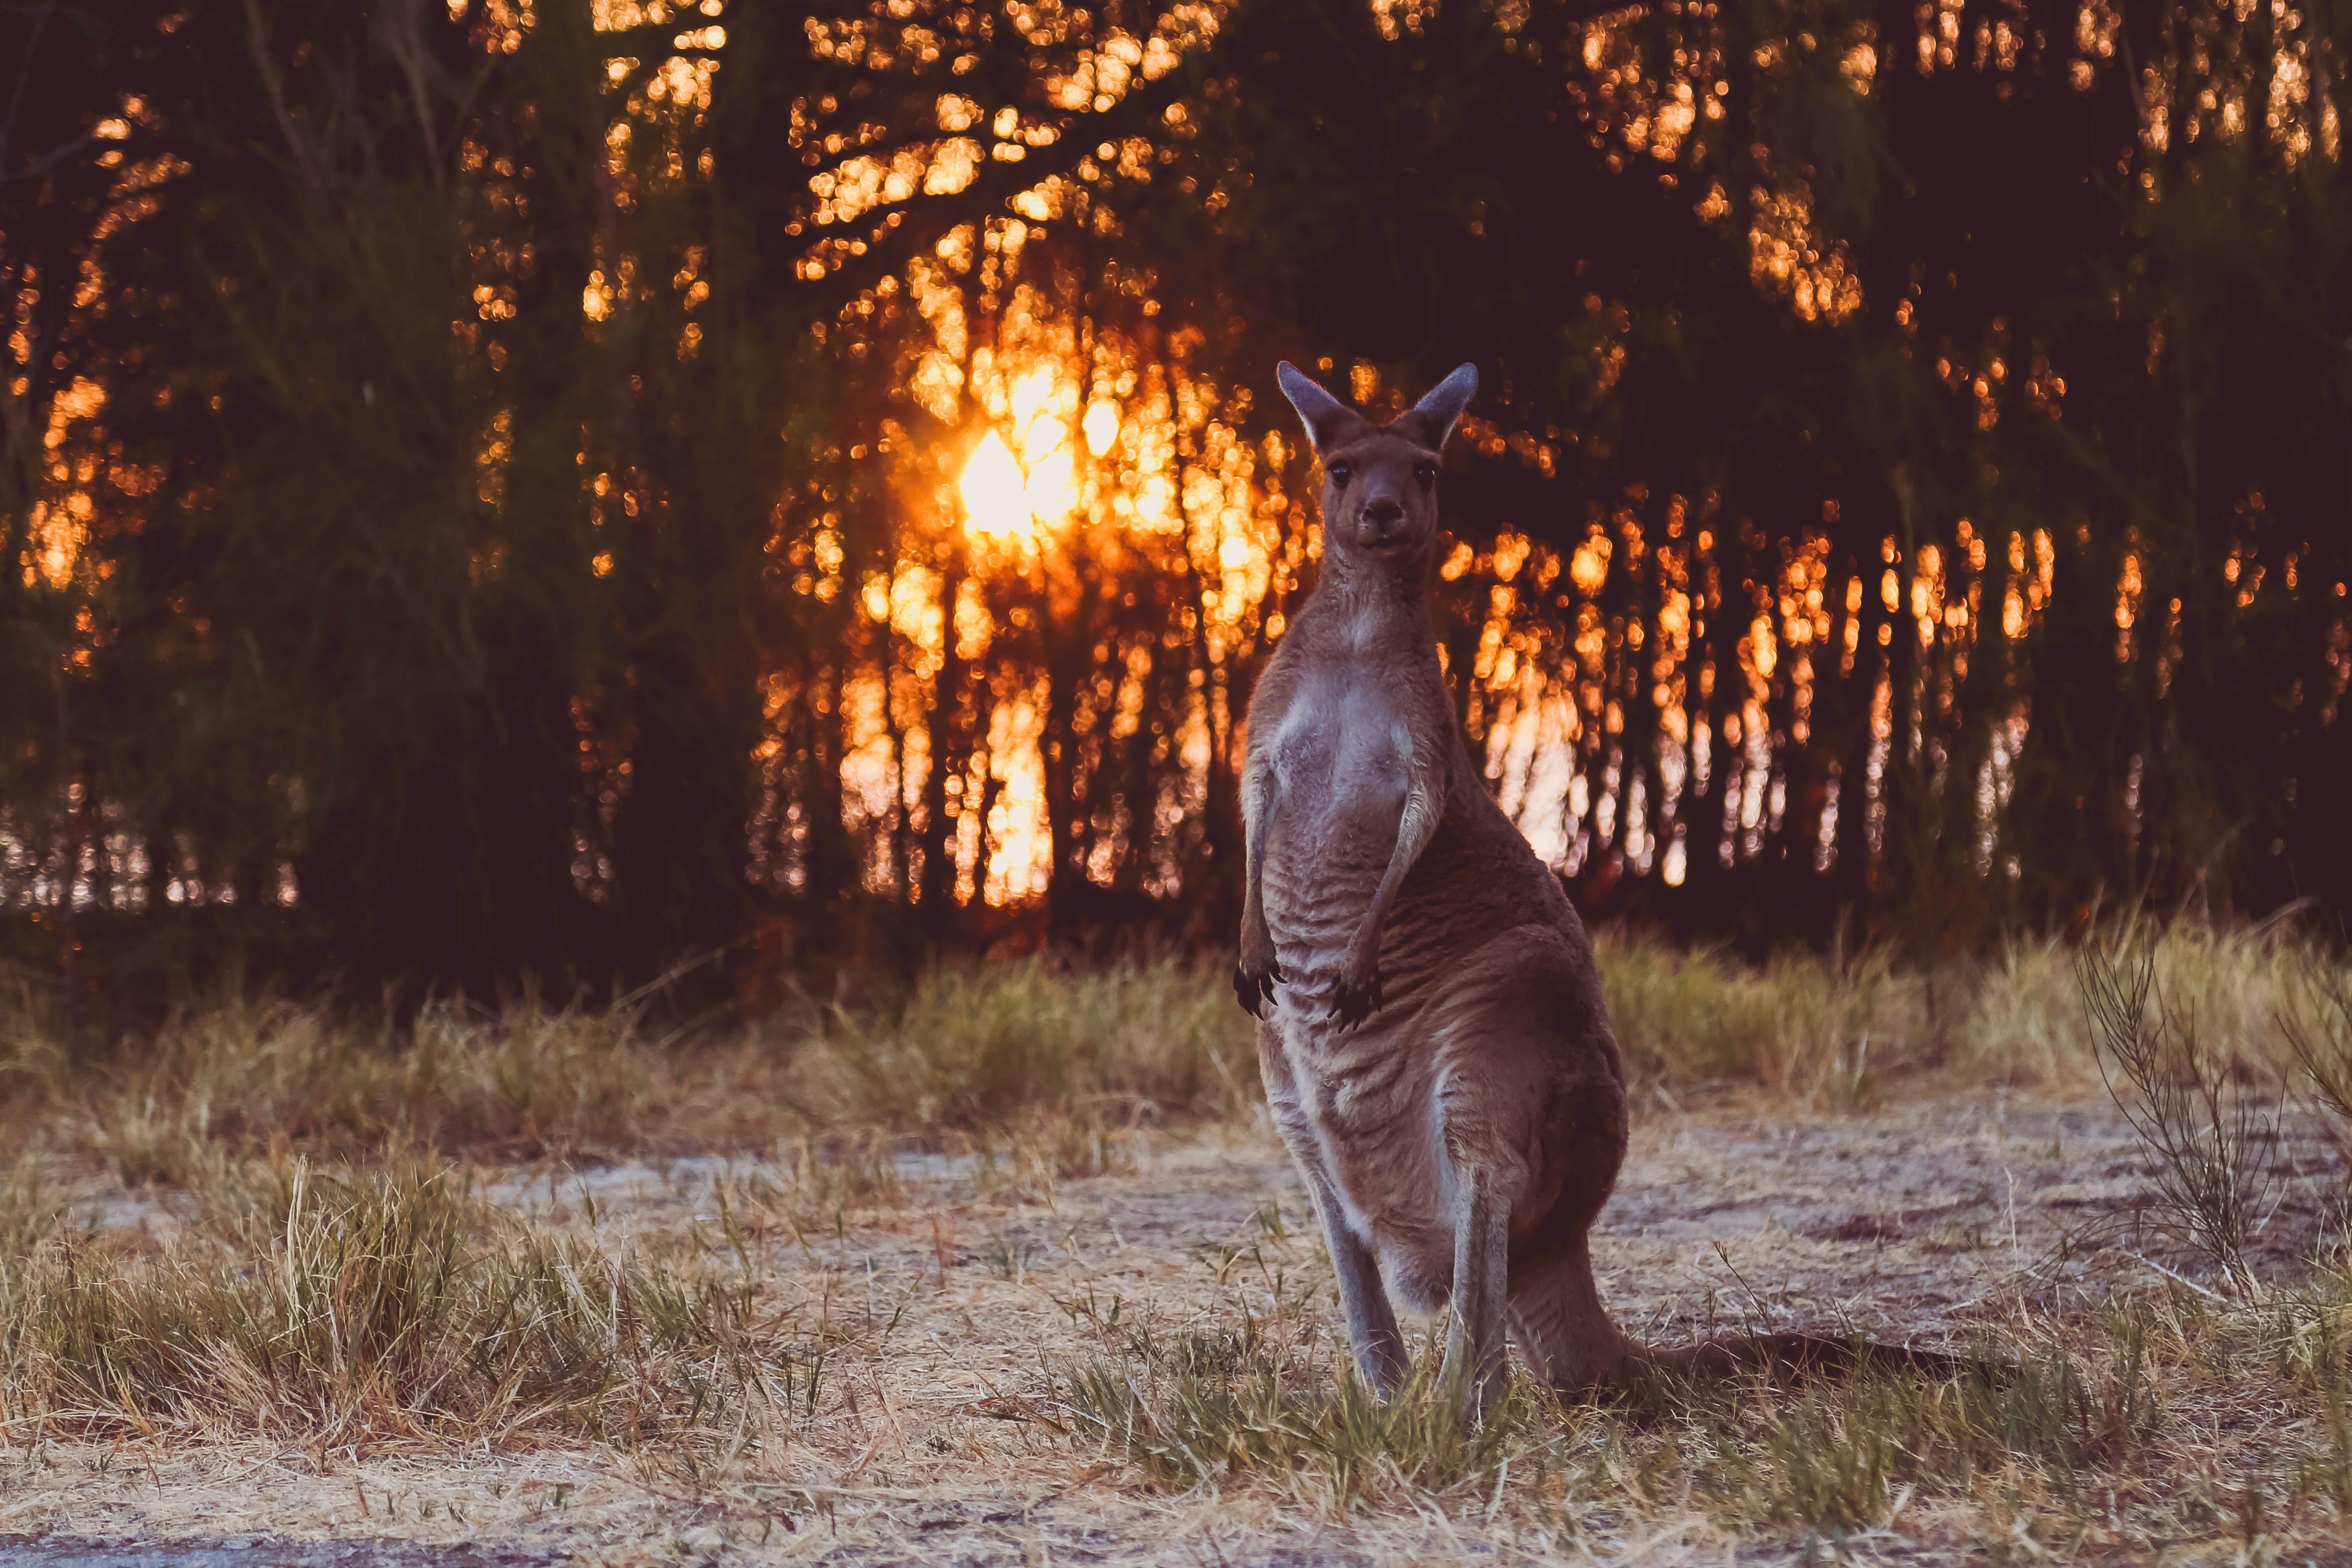 Gratis arkivbilde med kenguru, solnedgang